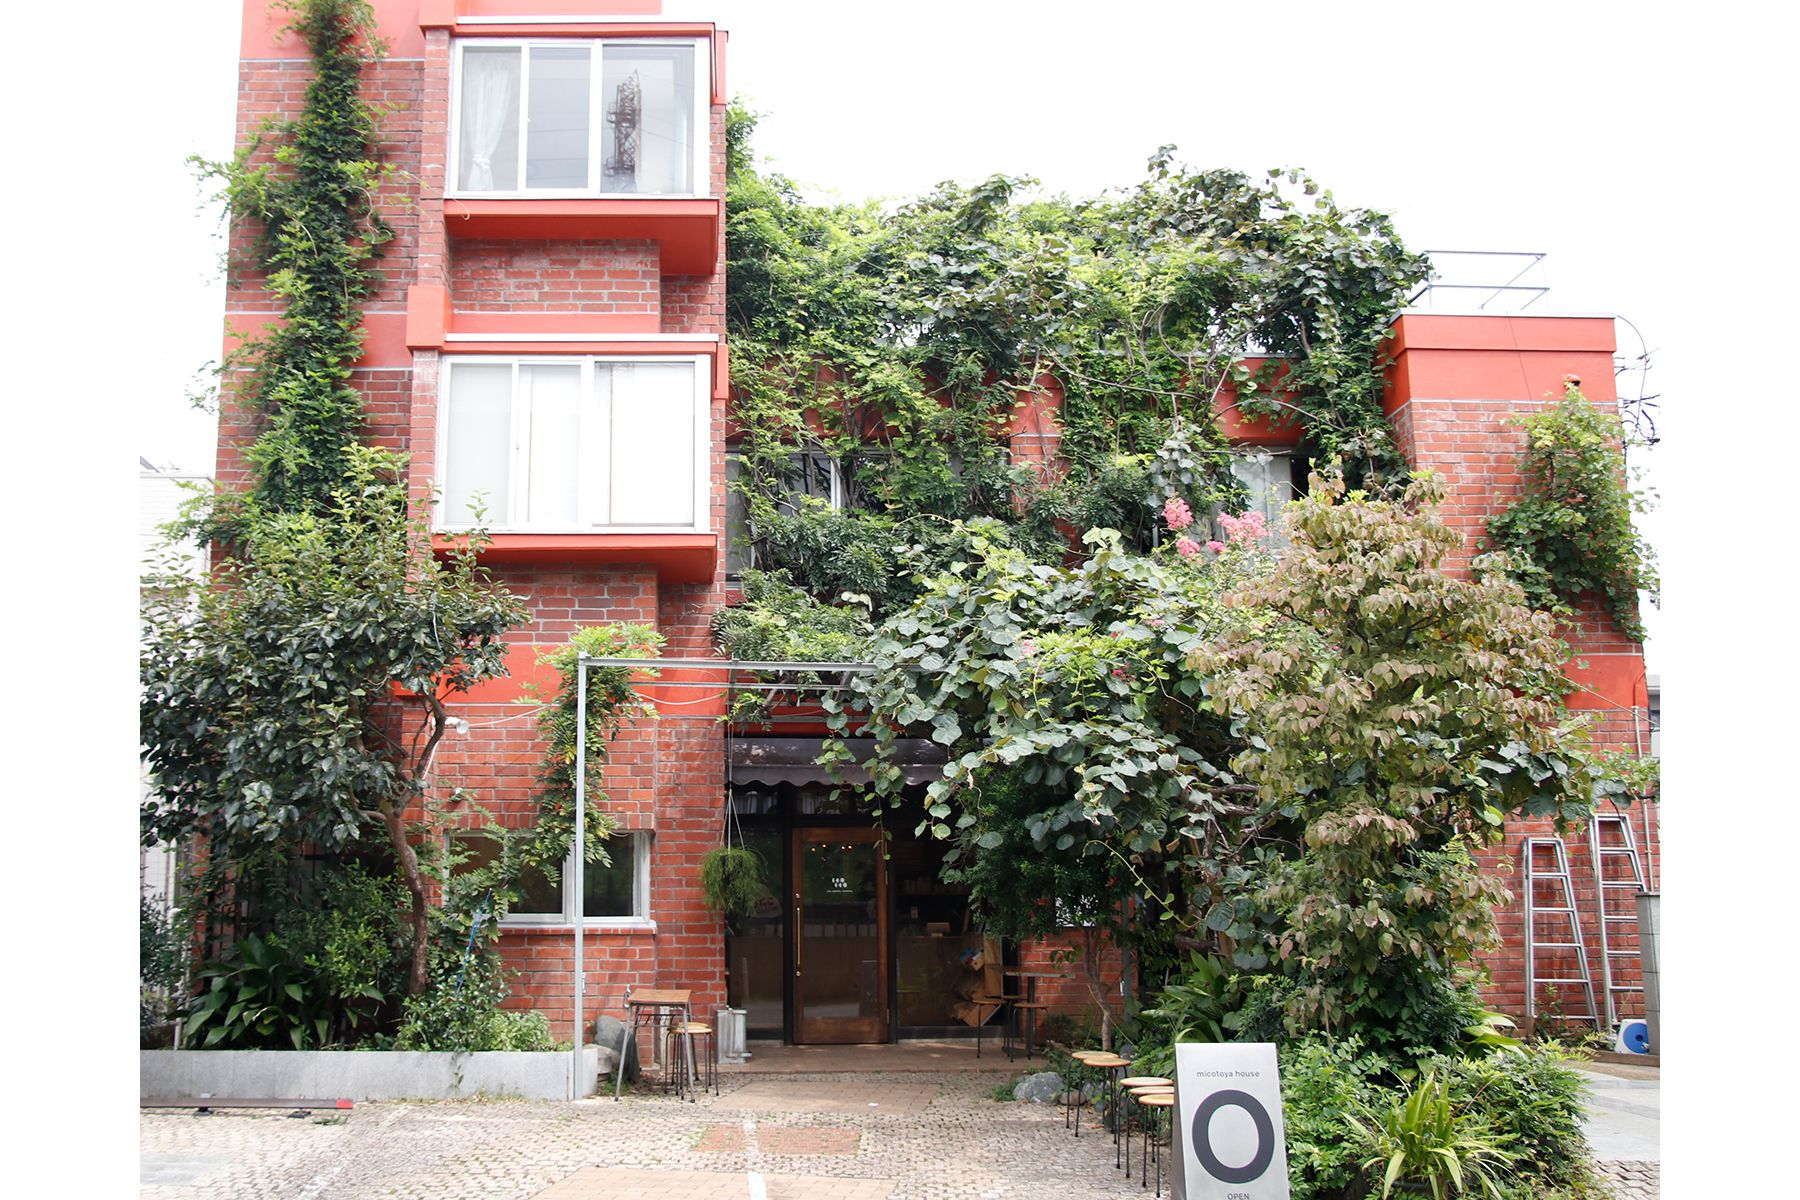 micotoya house (アイス屋/青果屋/shop)建物を蔦が覆う